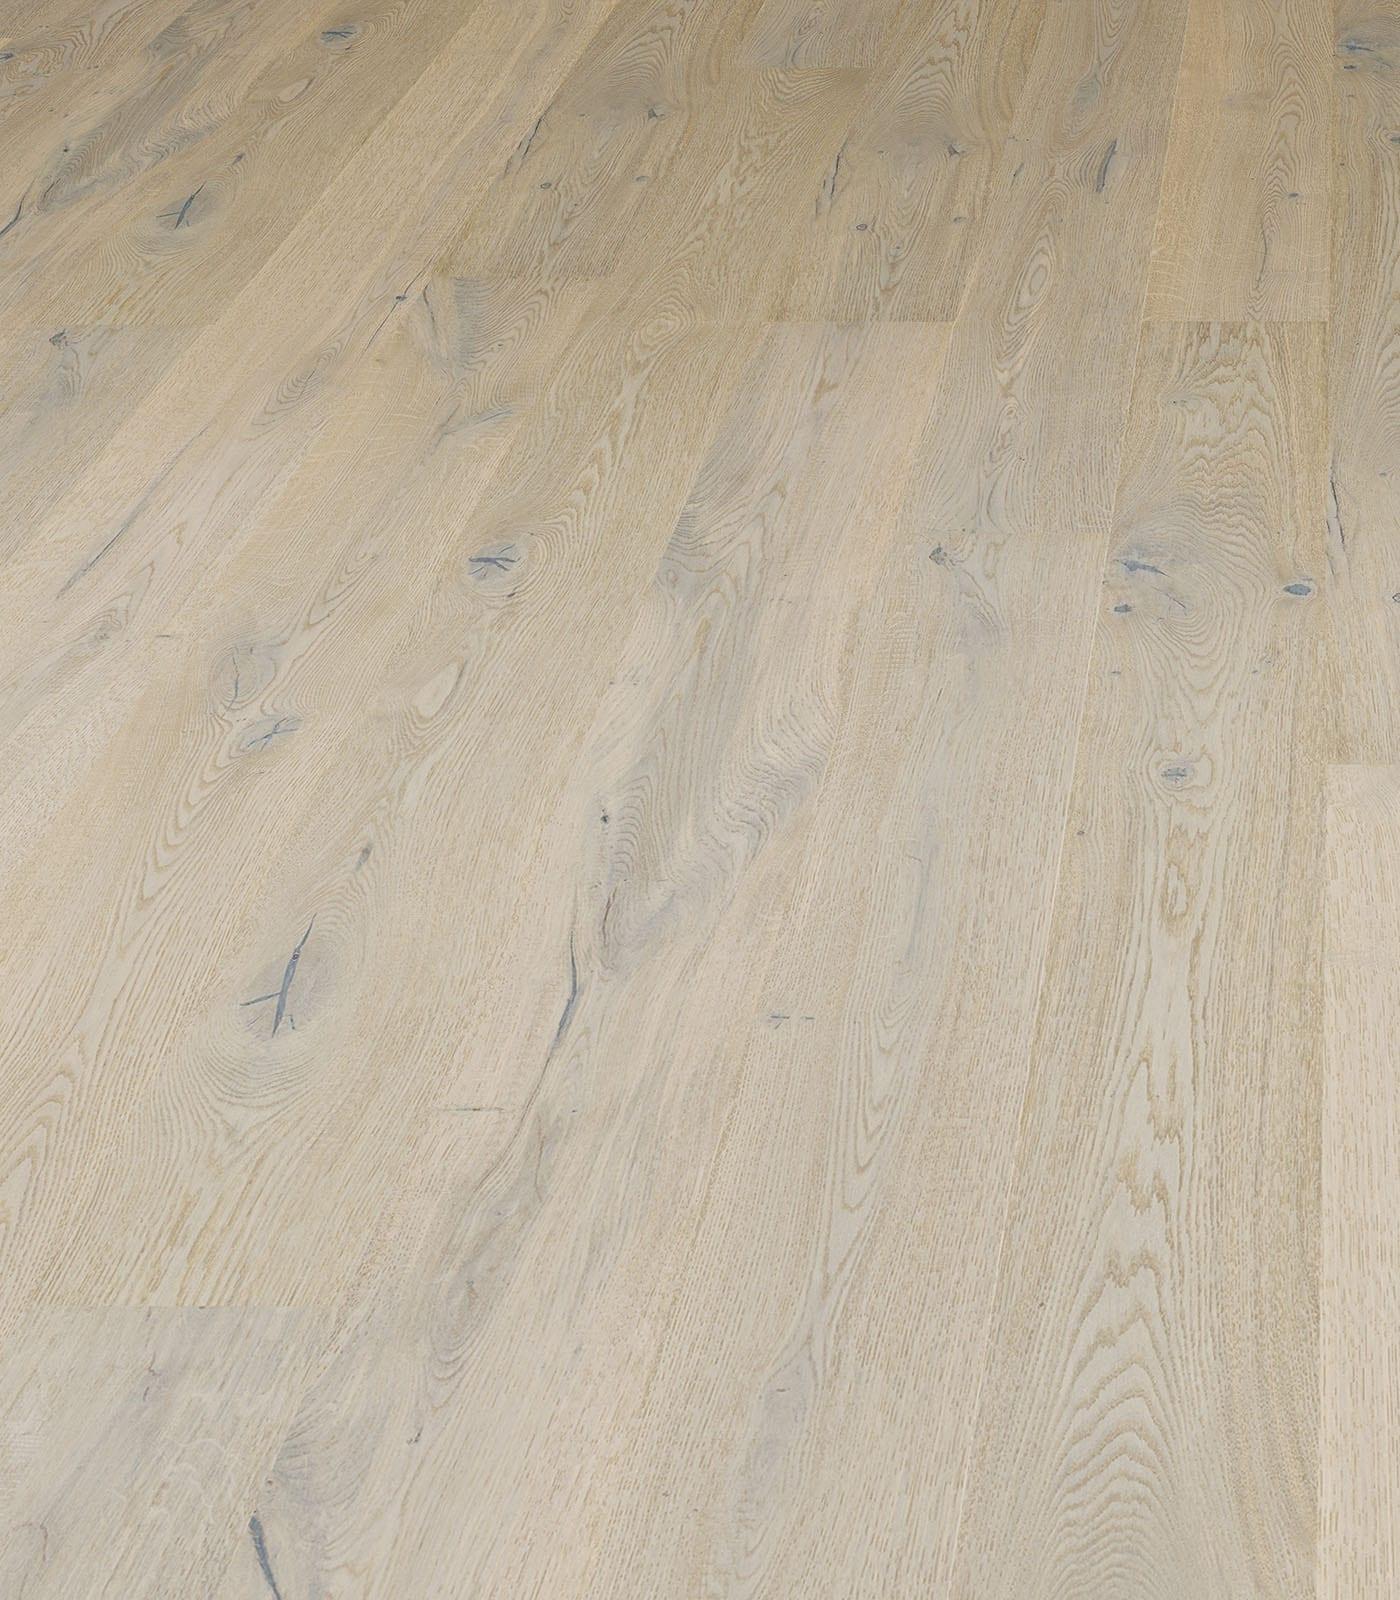 Ellsworth-Antique Collection-European Oak Floors-angle